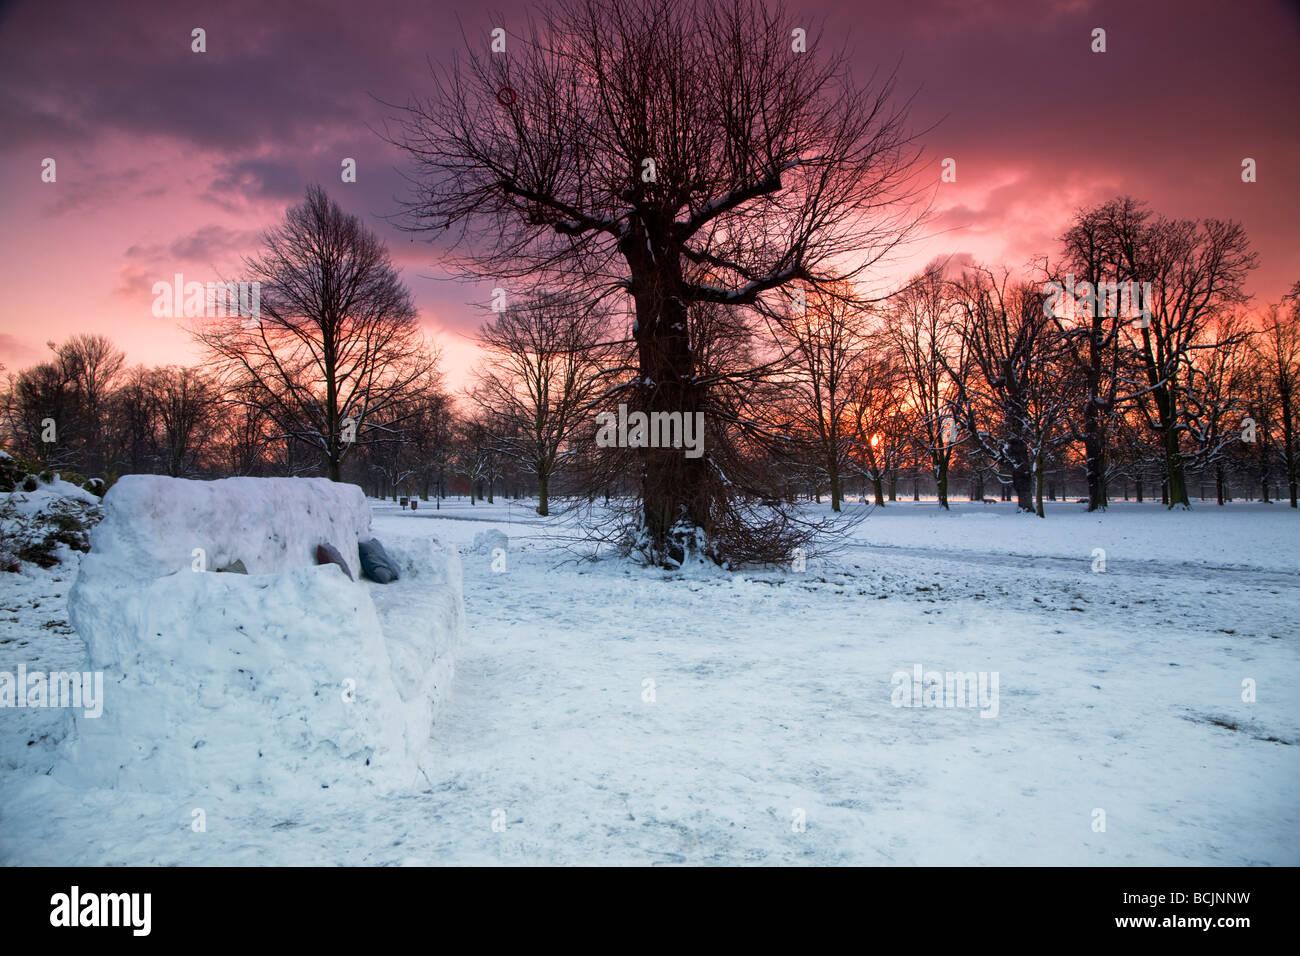 England, London, Kensington Gardens, Kensington, Schnee liege Stockfoto